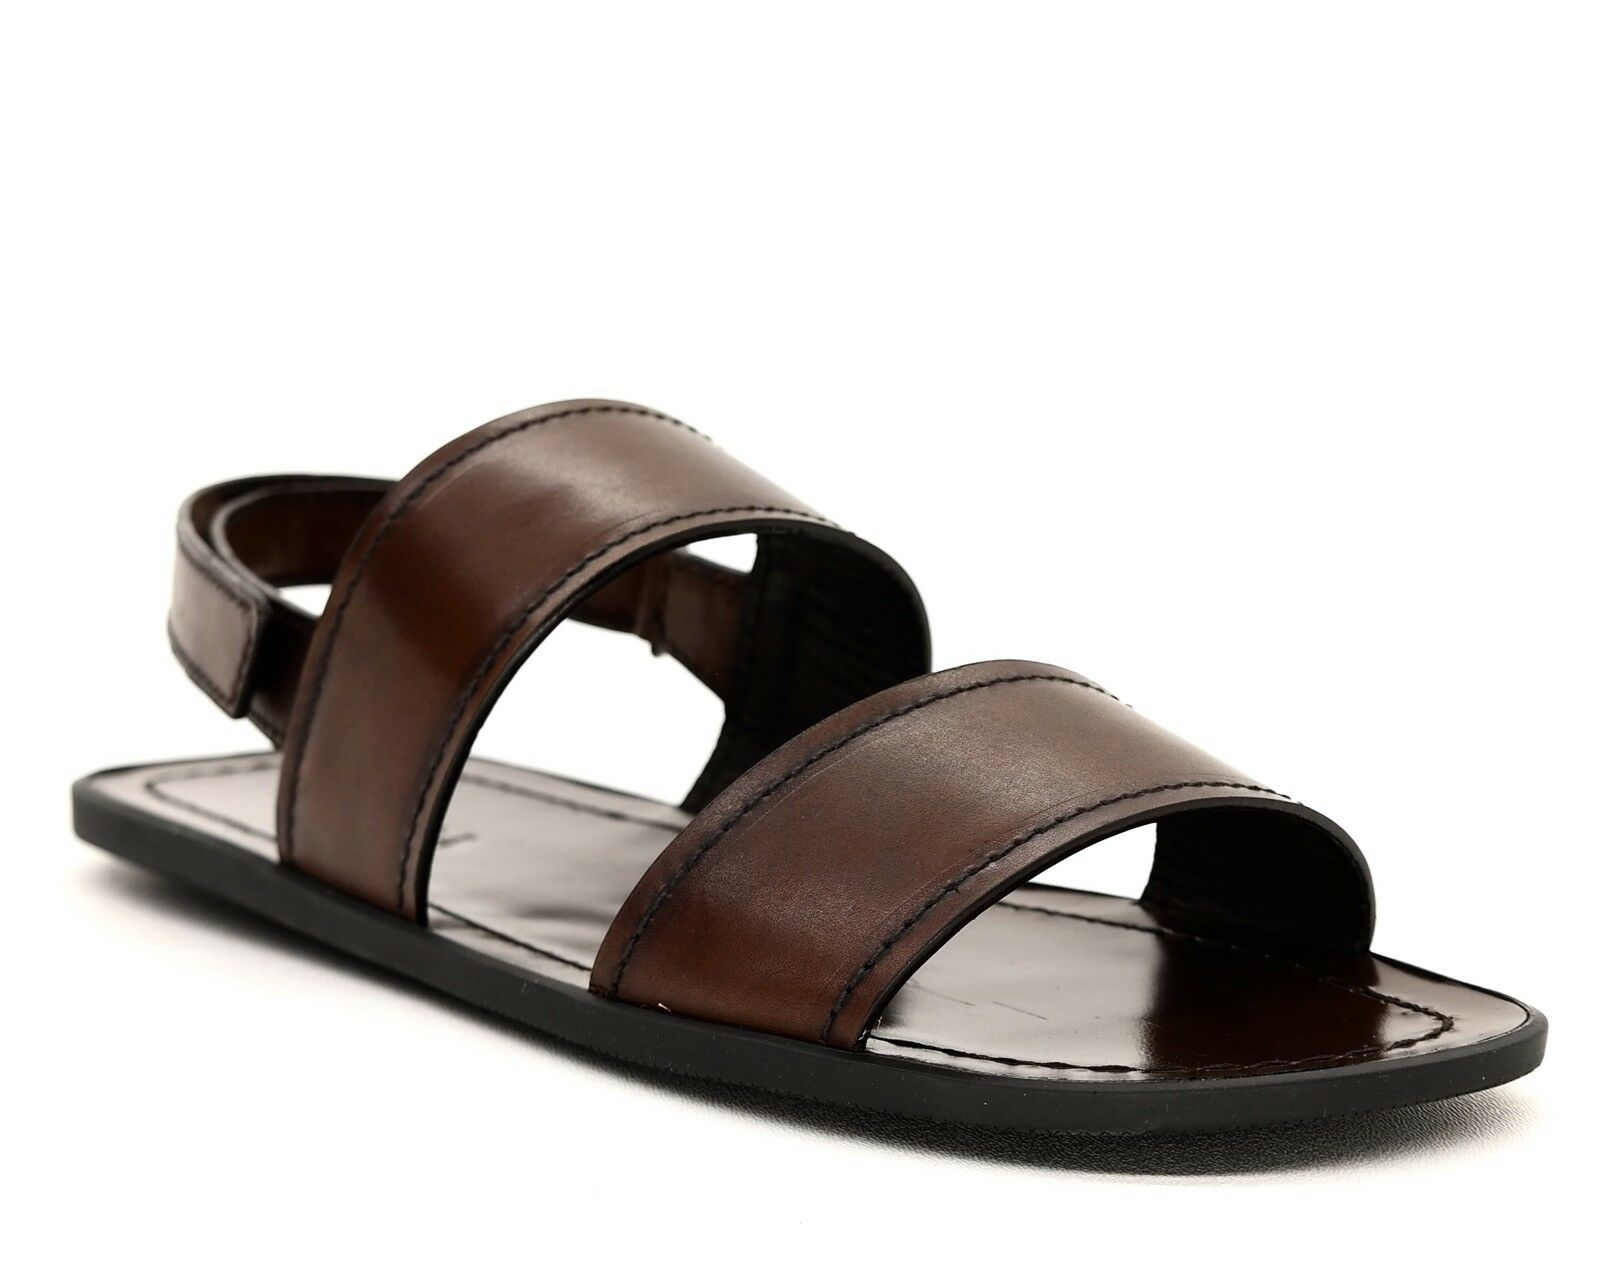 Prada Sandals Brown Pelle Straps Size 8.5 NIB